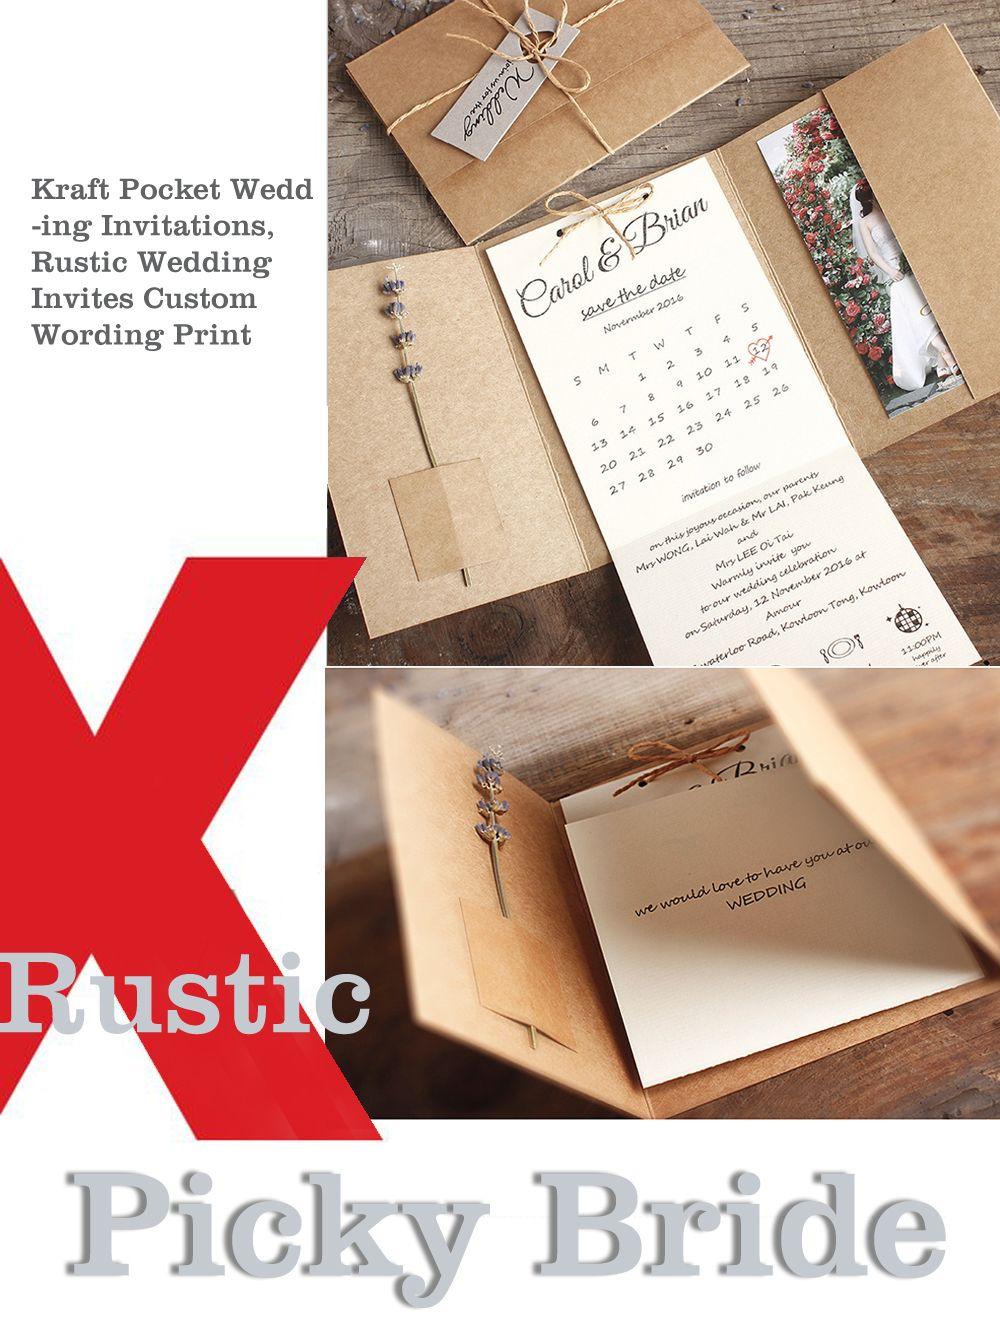 67a9ee230d878 Kraft Pocket Wedding Invitations, Rustic Wedding Invites Custom ...